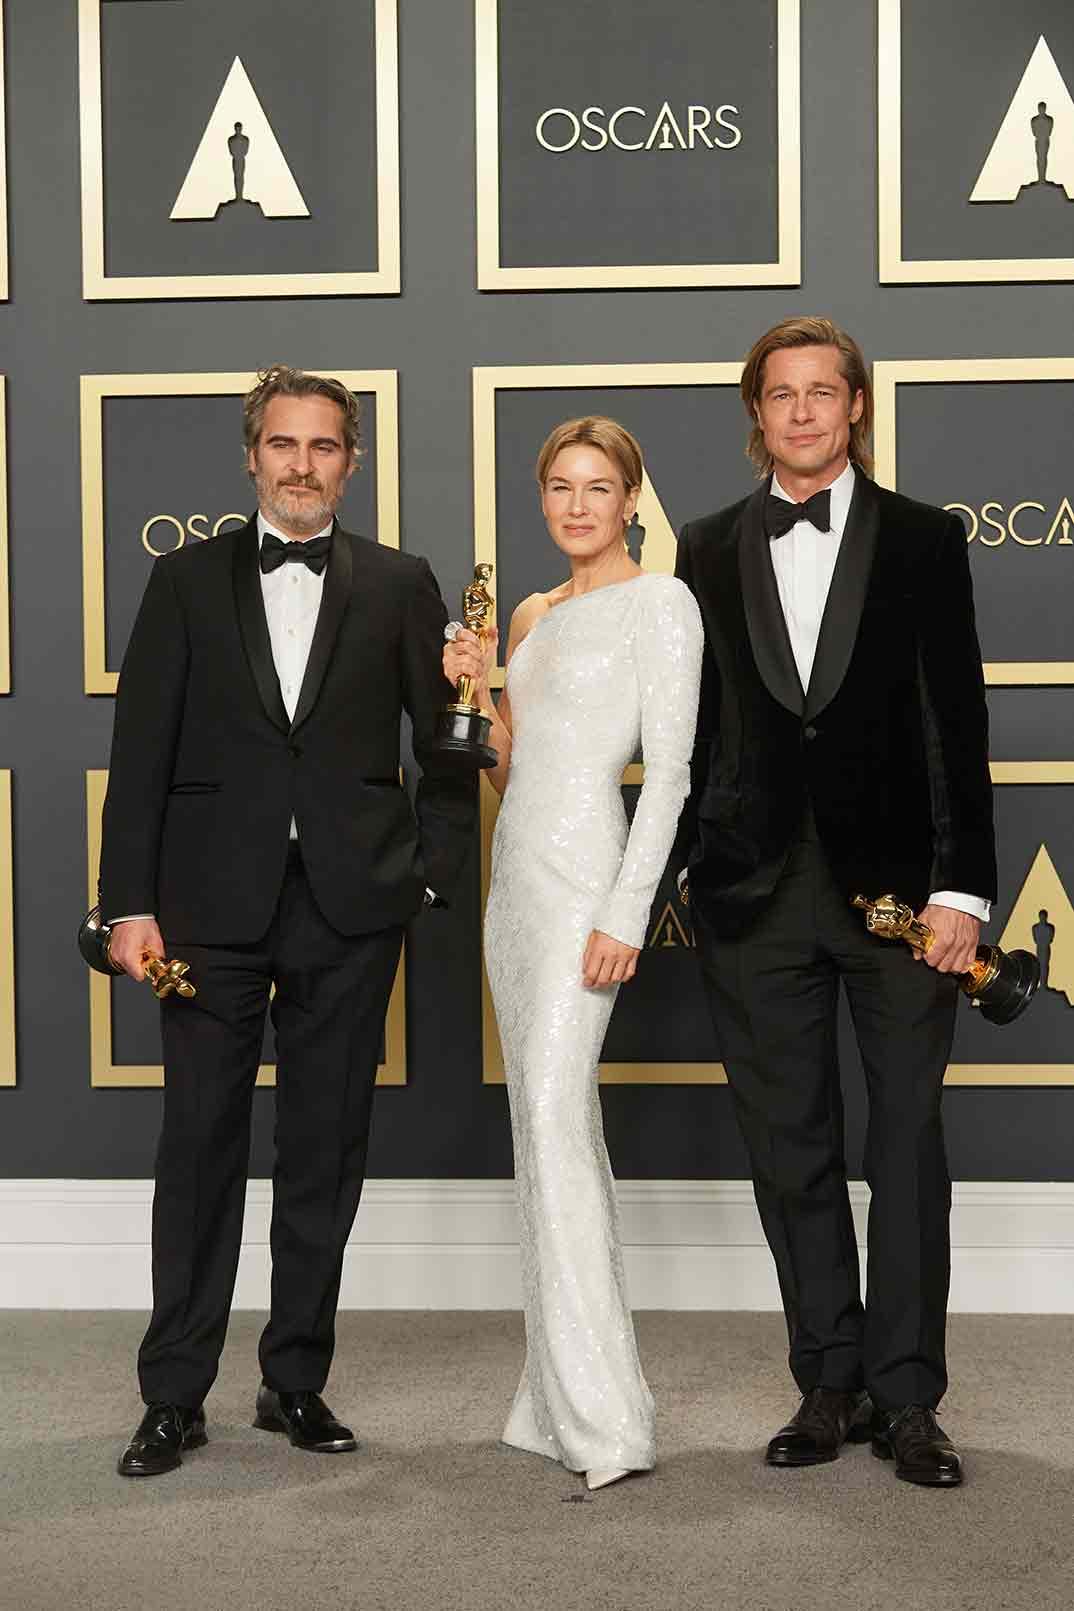 Joaquin Phoenix, Renee Zellwegger y Brad Pitt - Oscars 2020 © A.M.P.A.S.